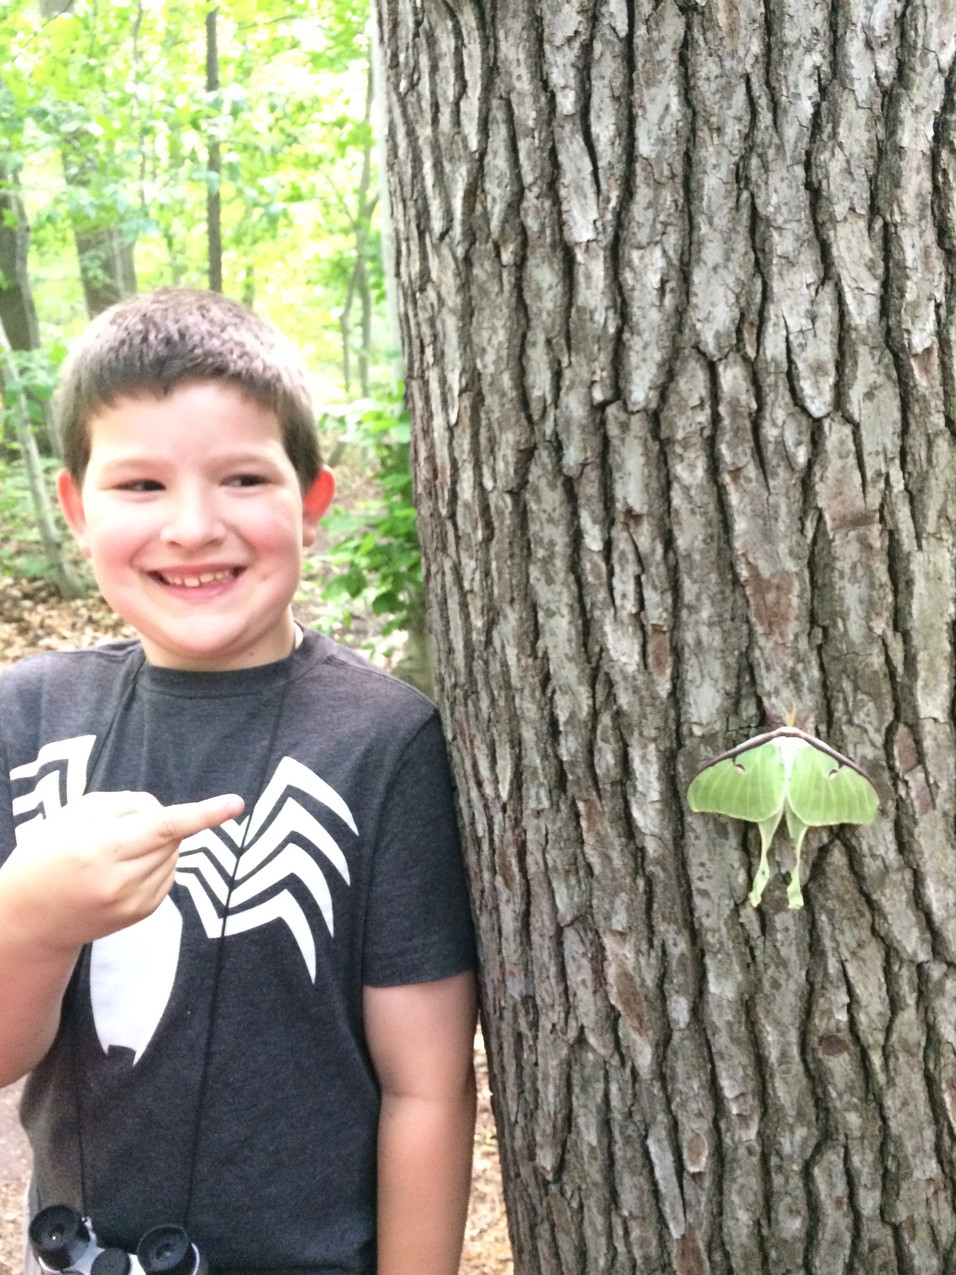 Luke and the Luna Moth